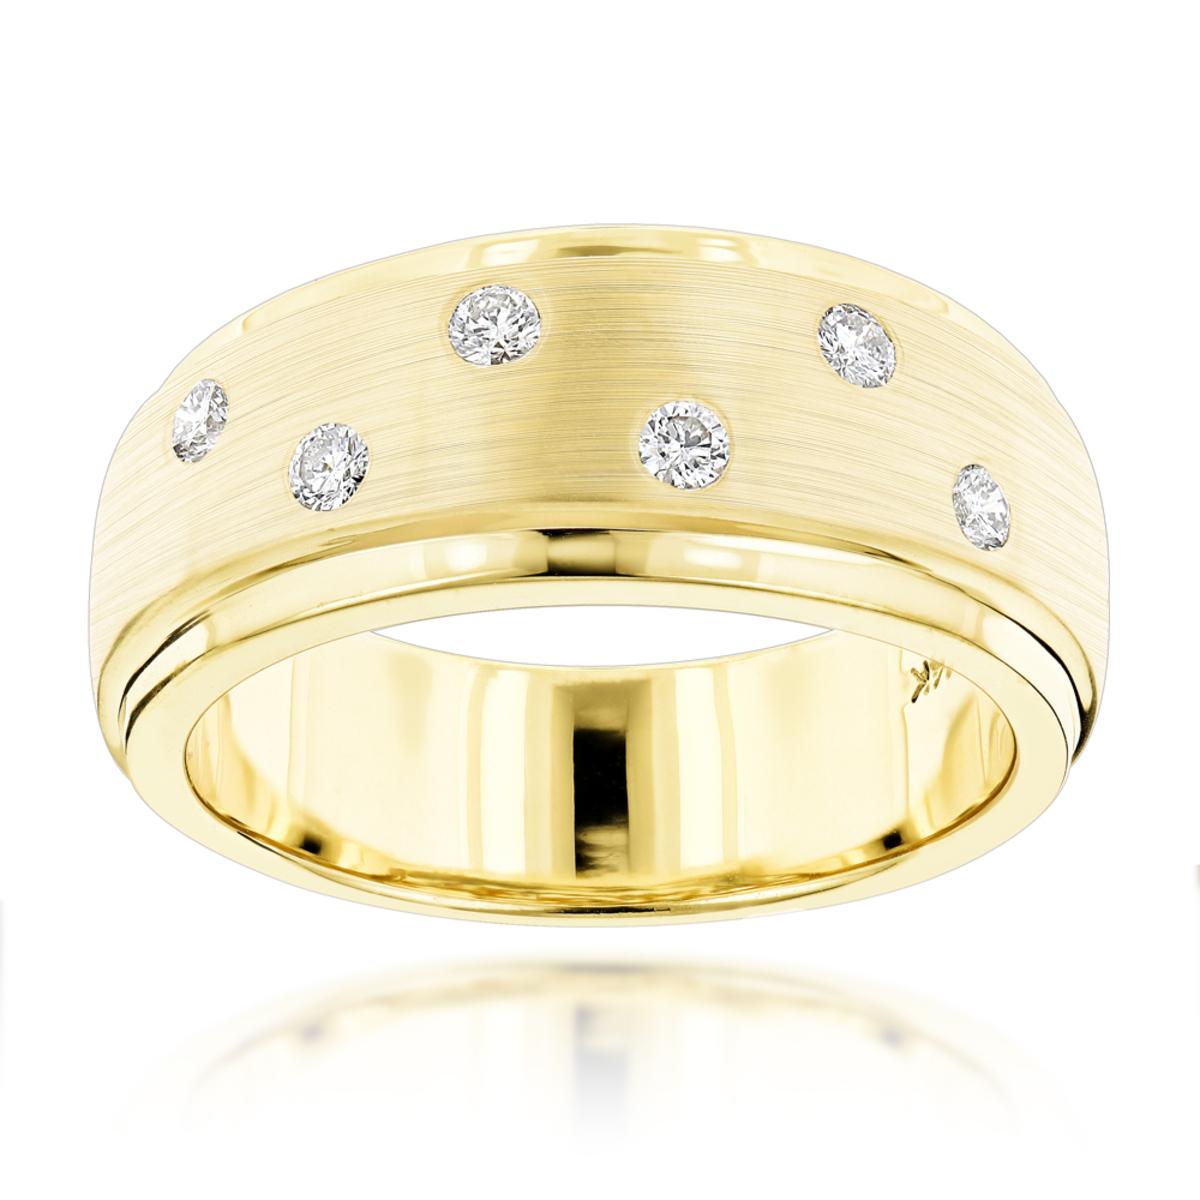 Designer Diamond Wedding Bands 14K Gold Mens Diamond Ring 0.35ct